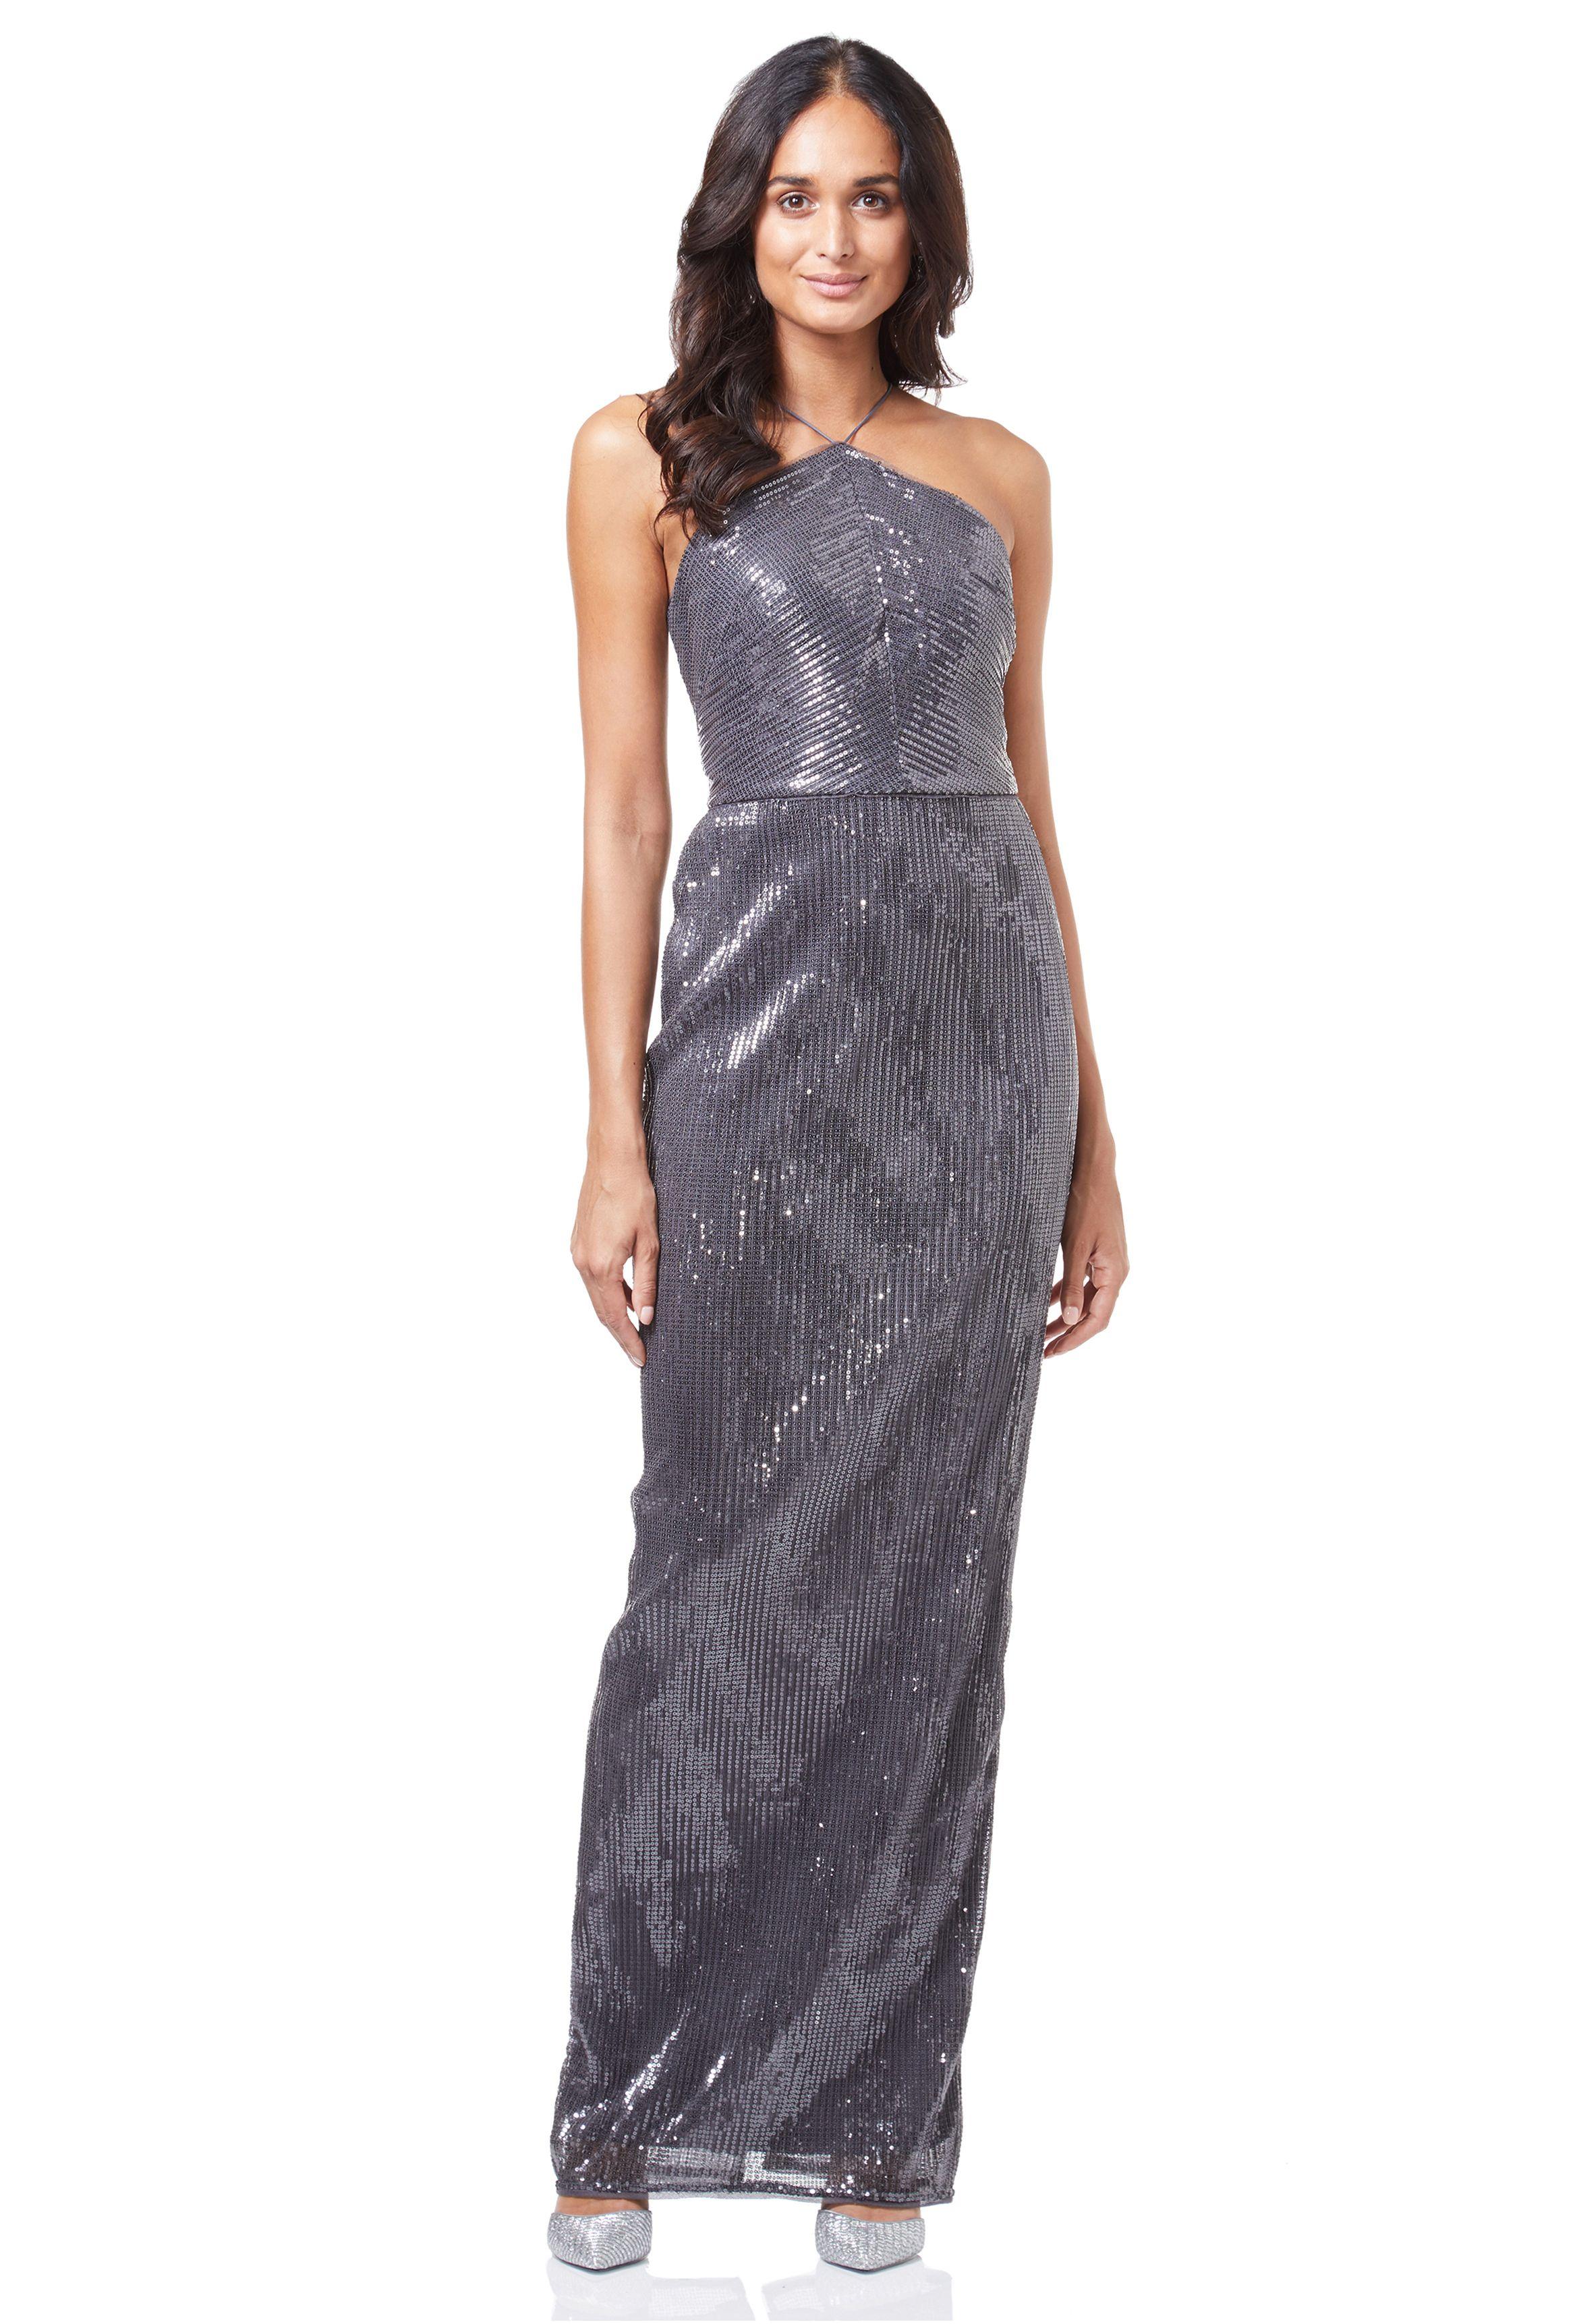 Grey wedding guest dress  Sequin Halter Column Back Slit Evening Dress by Adrianna Papell